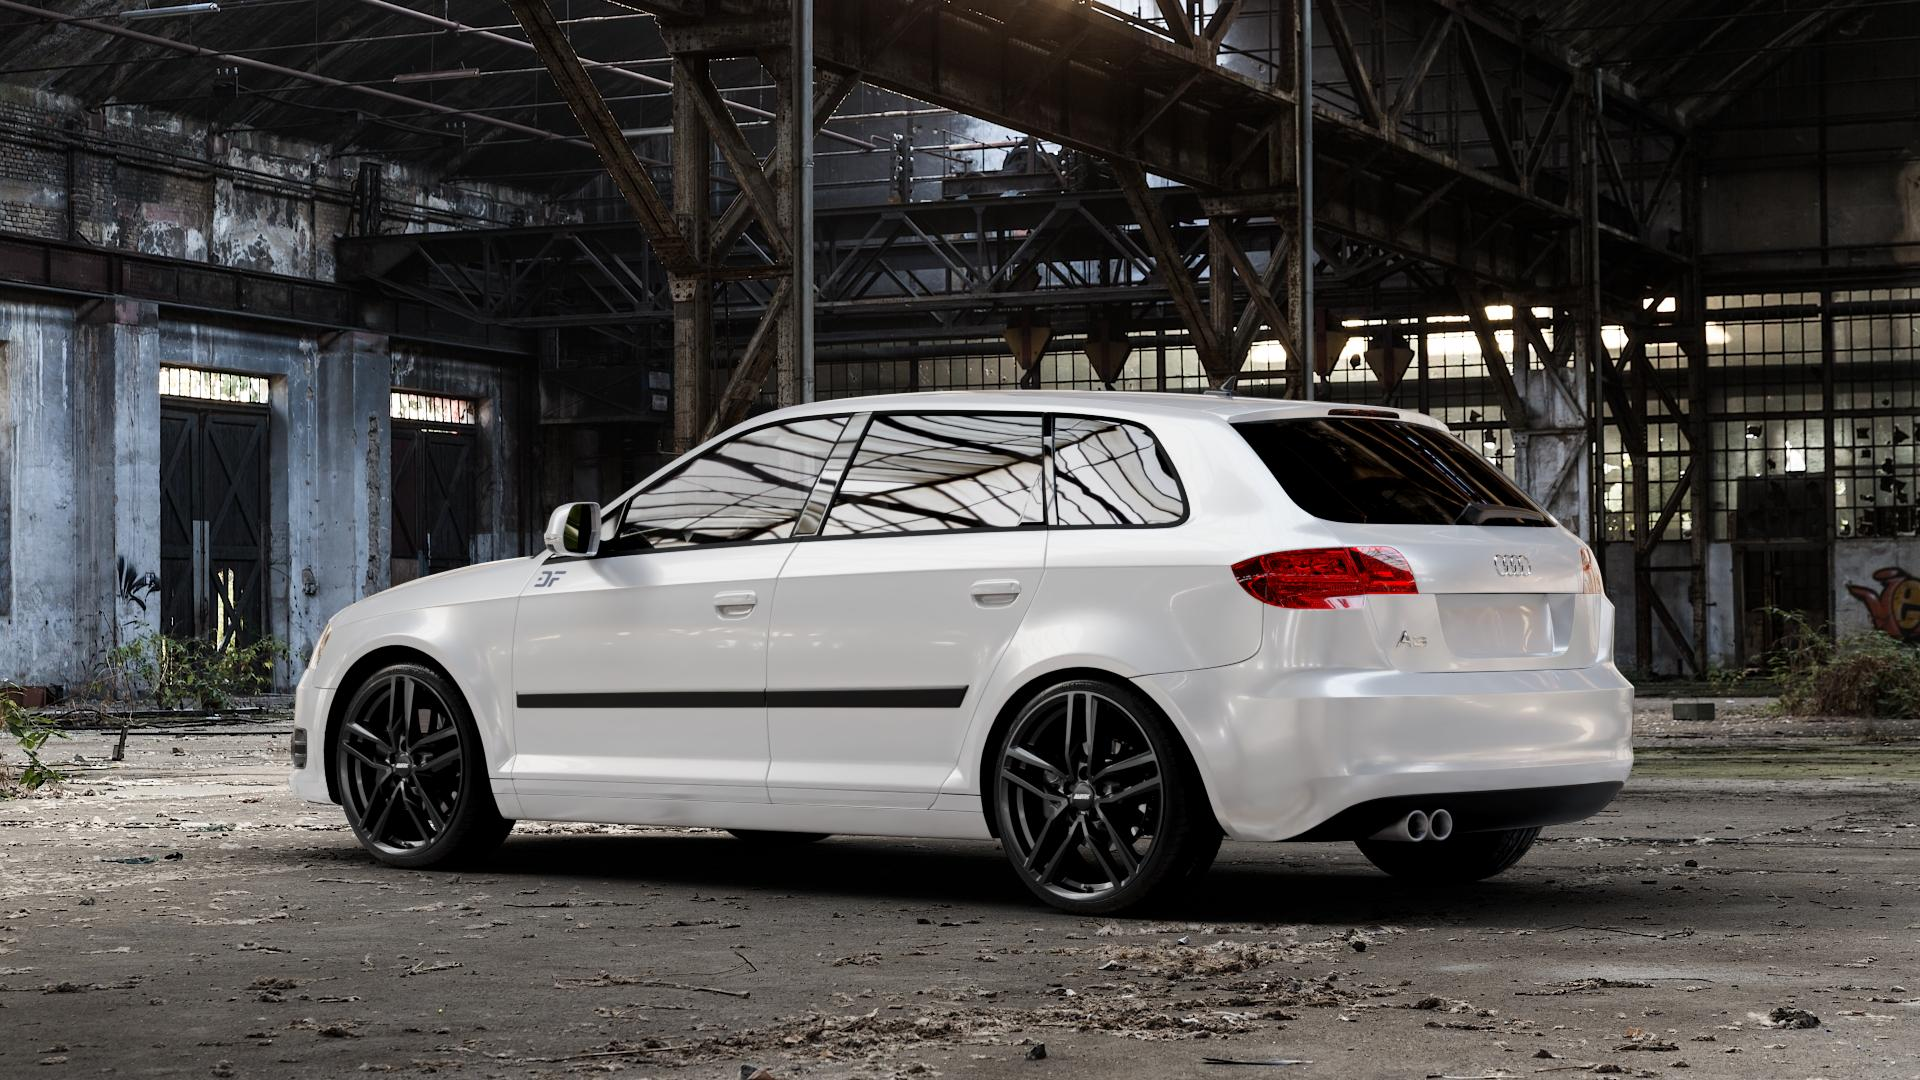 ALUTEC Ikenu diamant-schwarz Felge mit Reifen in 19Zoll Winterfelge Alufelge auf weissem Audi A3 Typ 8P (Sportback) 1,6l 75kW (102 PS) 2,0l FSI 110kW (150 1,9l TDI 77kW (105 103kW (140 TFSI 147kW (200 85kW (116 100kW (136 1,8l 118kW (160 125kW (170 1,4l 92kW (125 120kW (163 quattro 3,2l V6 184kW (250 S3 195kW (265 1,2l 66kW (90 18